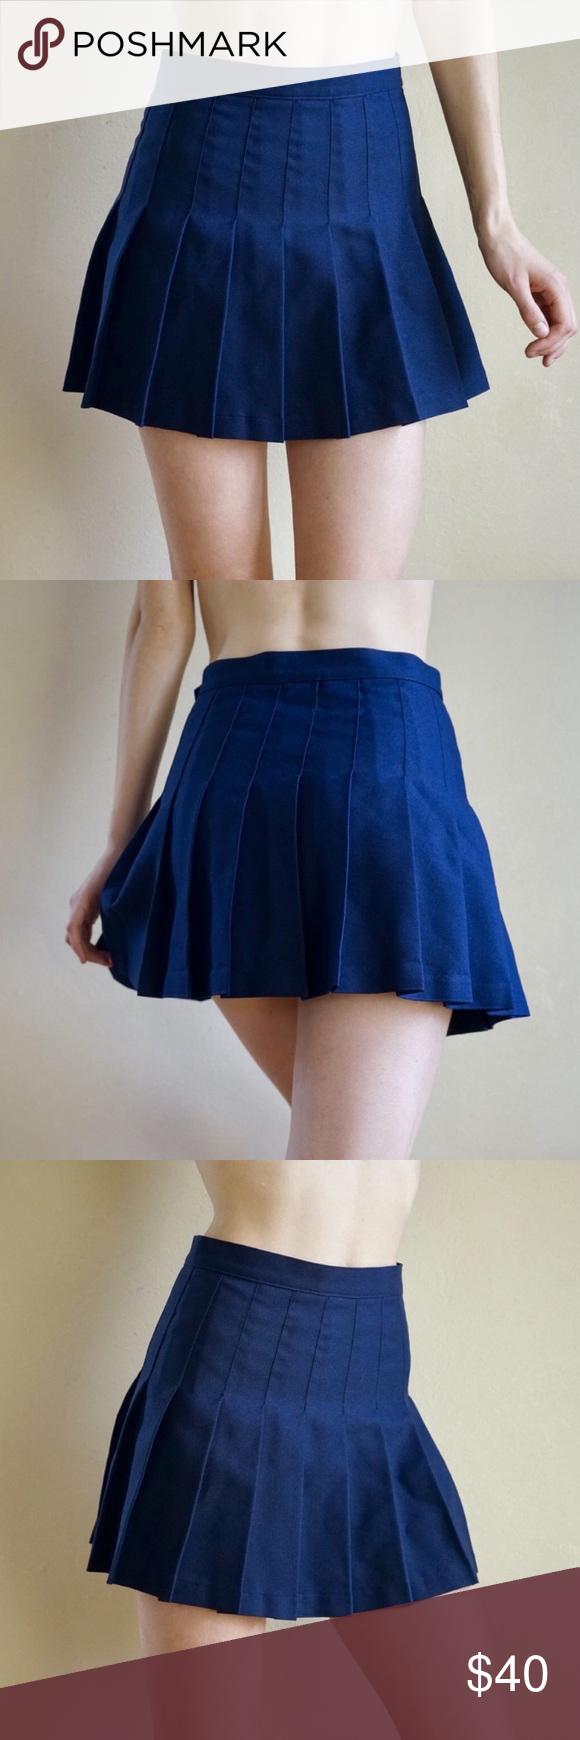 dc6156f62b Navy blue American Apparel tennis skirt Navy blue American Apparel high  waisted pleated tennis skirt.